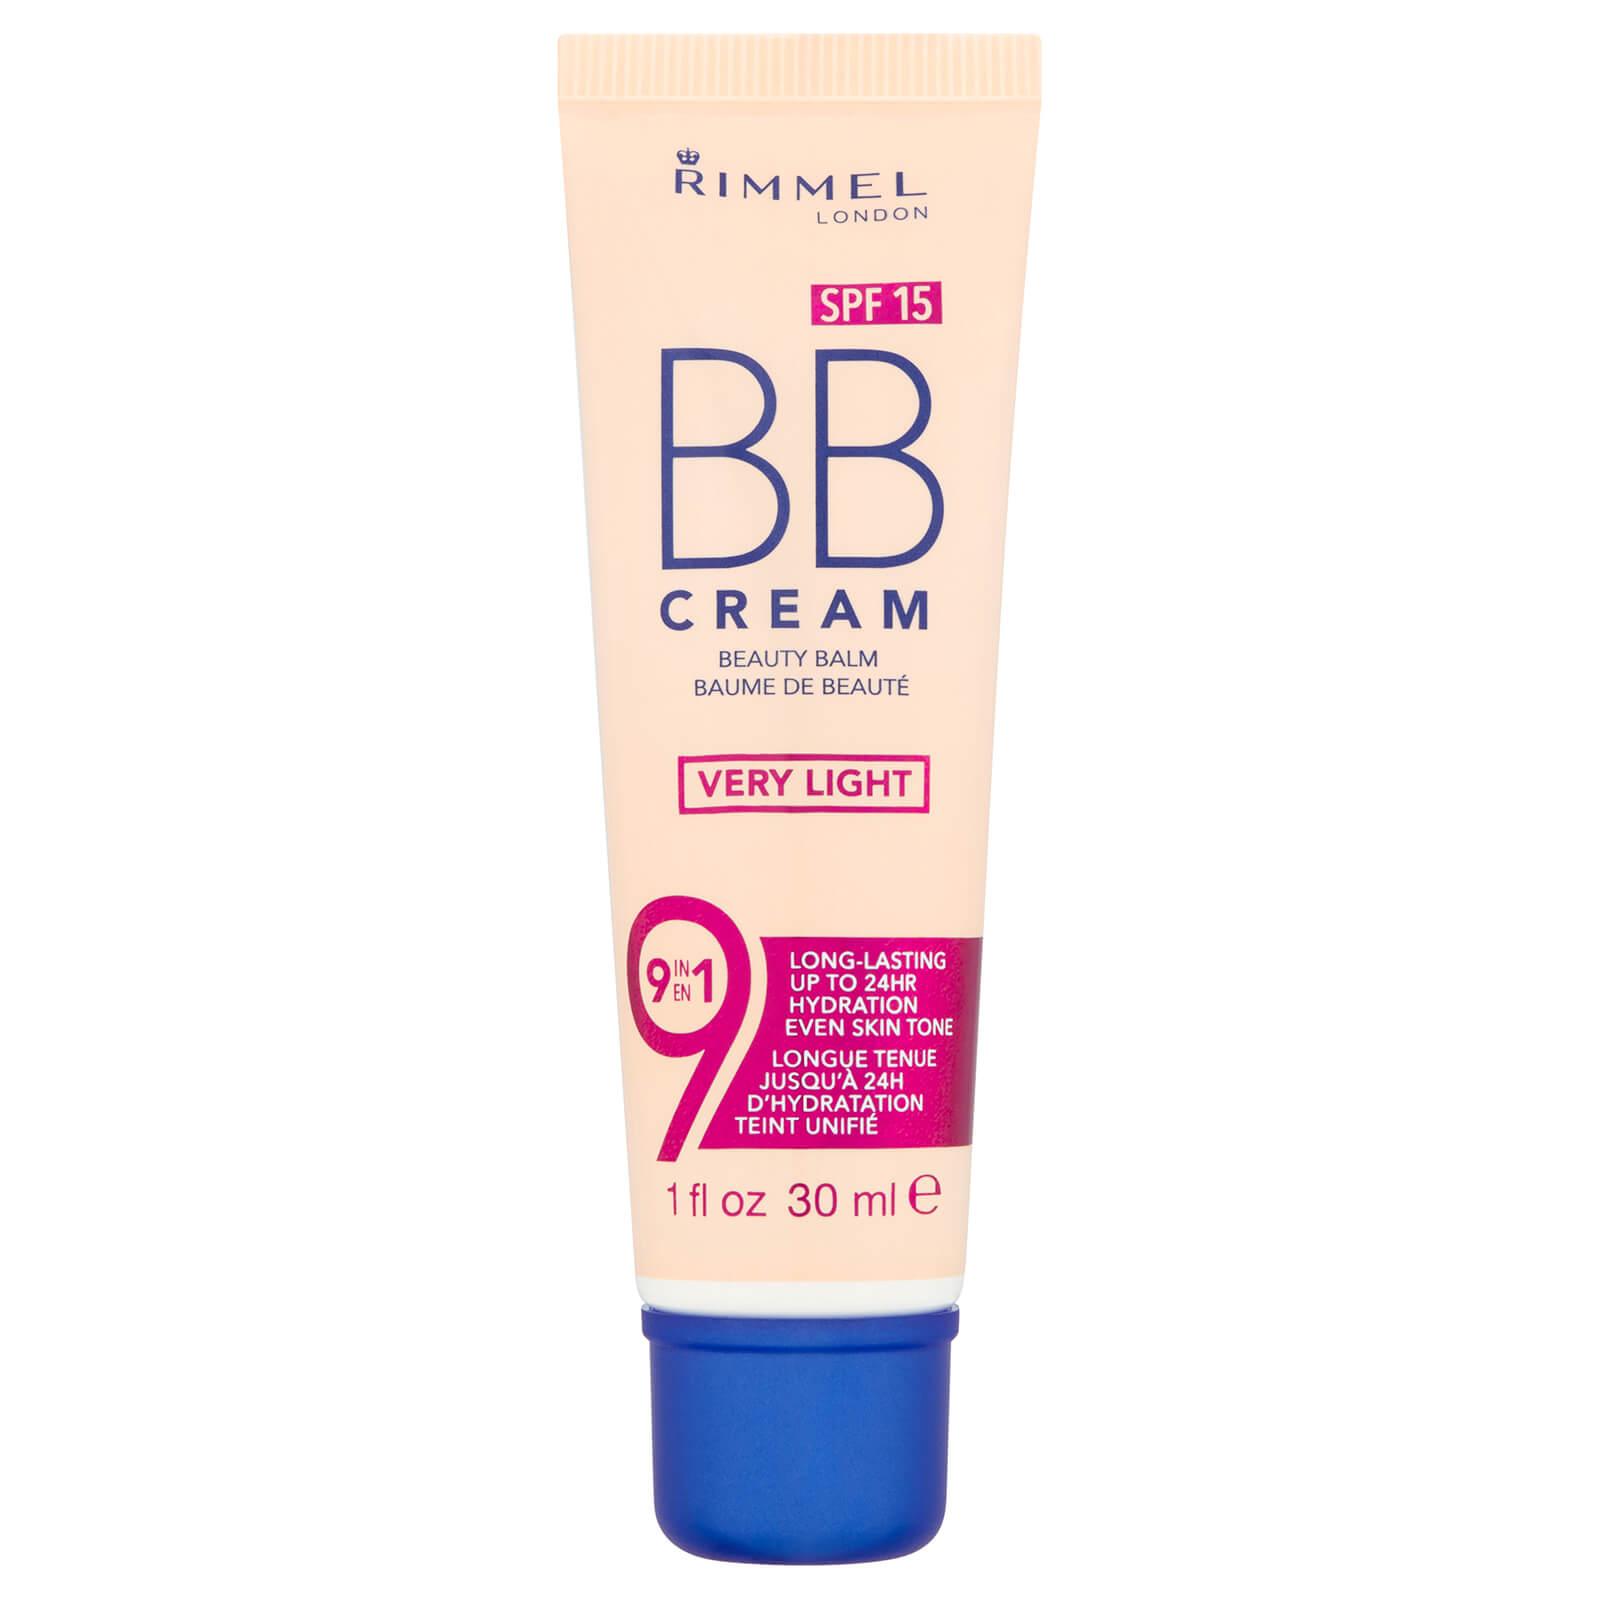 Rimmel 9-in-1 Super Make-Up BB Cream 30ml (Various Shades) - Very Light